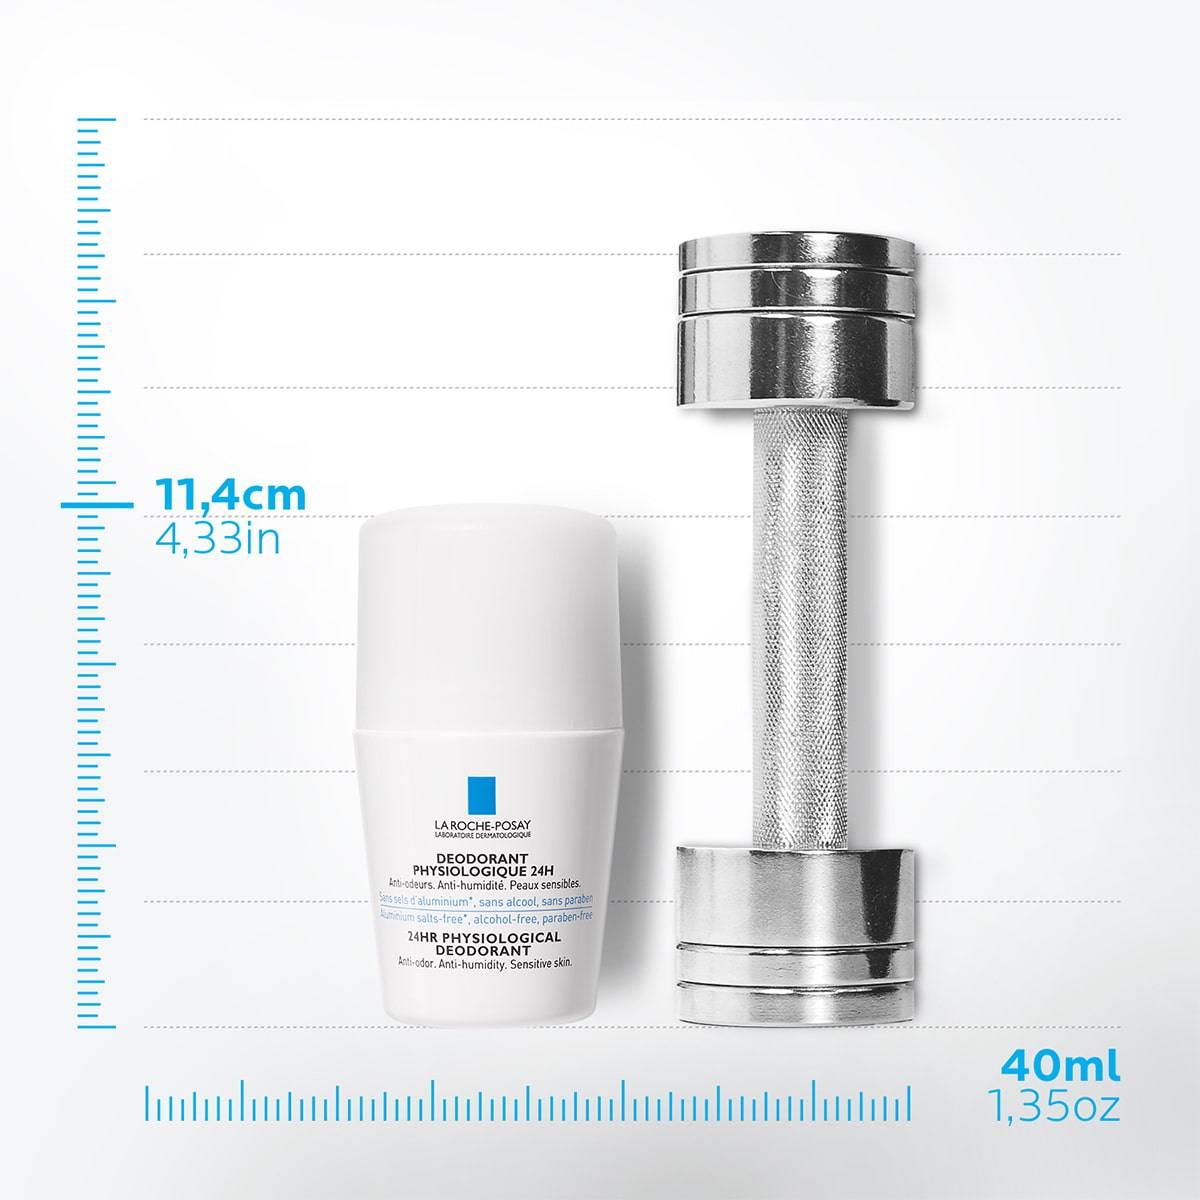 La Roche Posay Tuotesivu Deodorant Physiological Roll On 24h 50ml 33